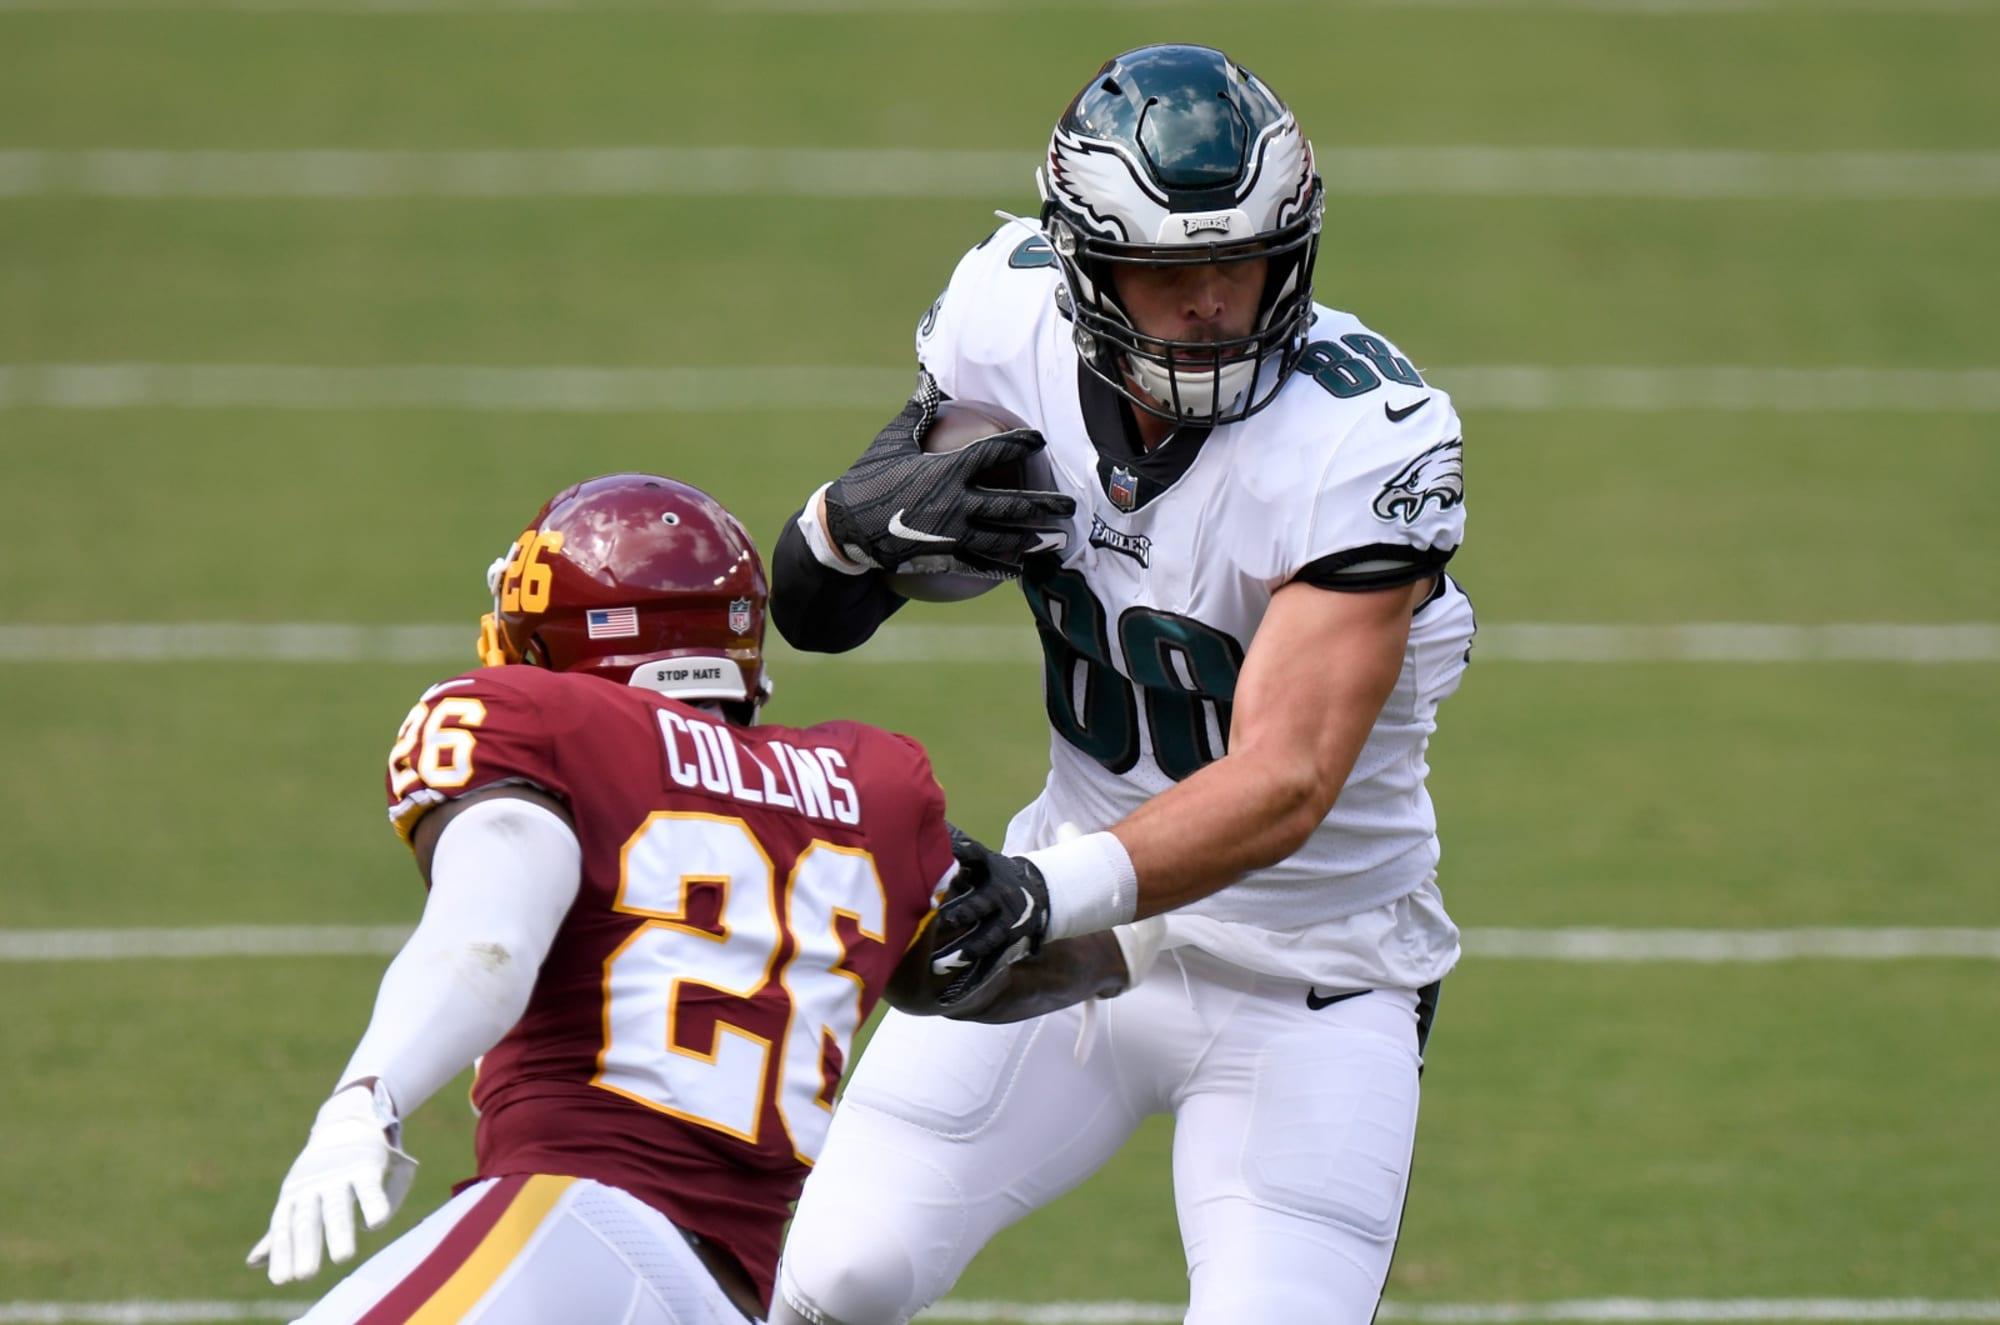 Dallas Goedert is good but Philadelphia Eagles fans need to slow down